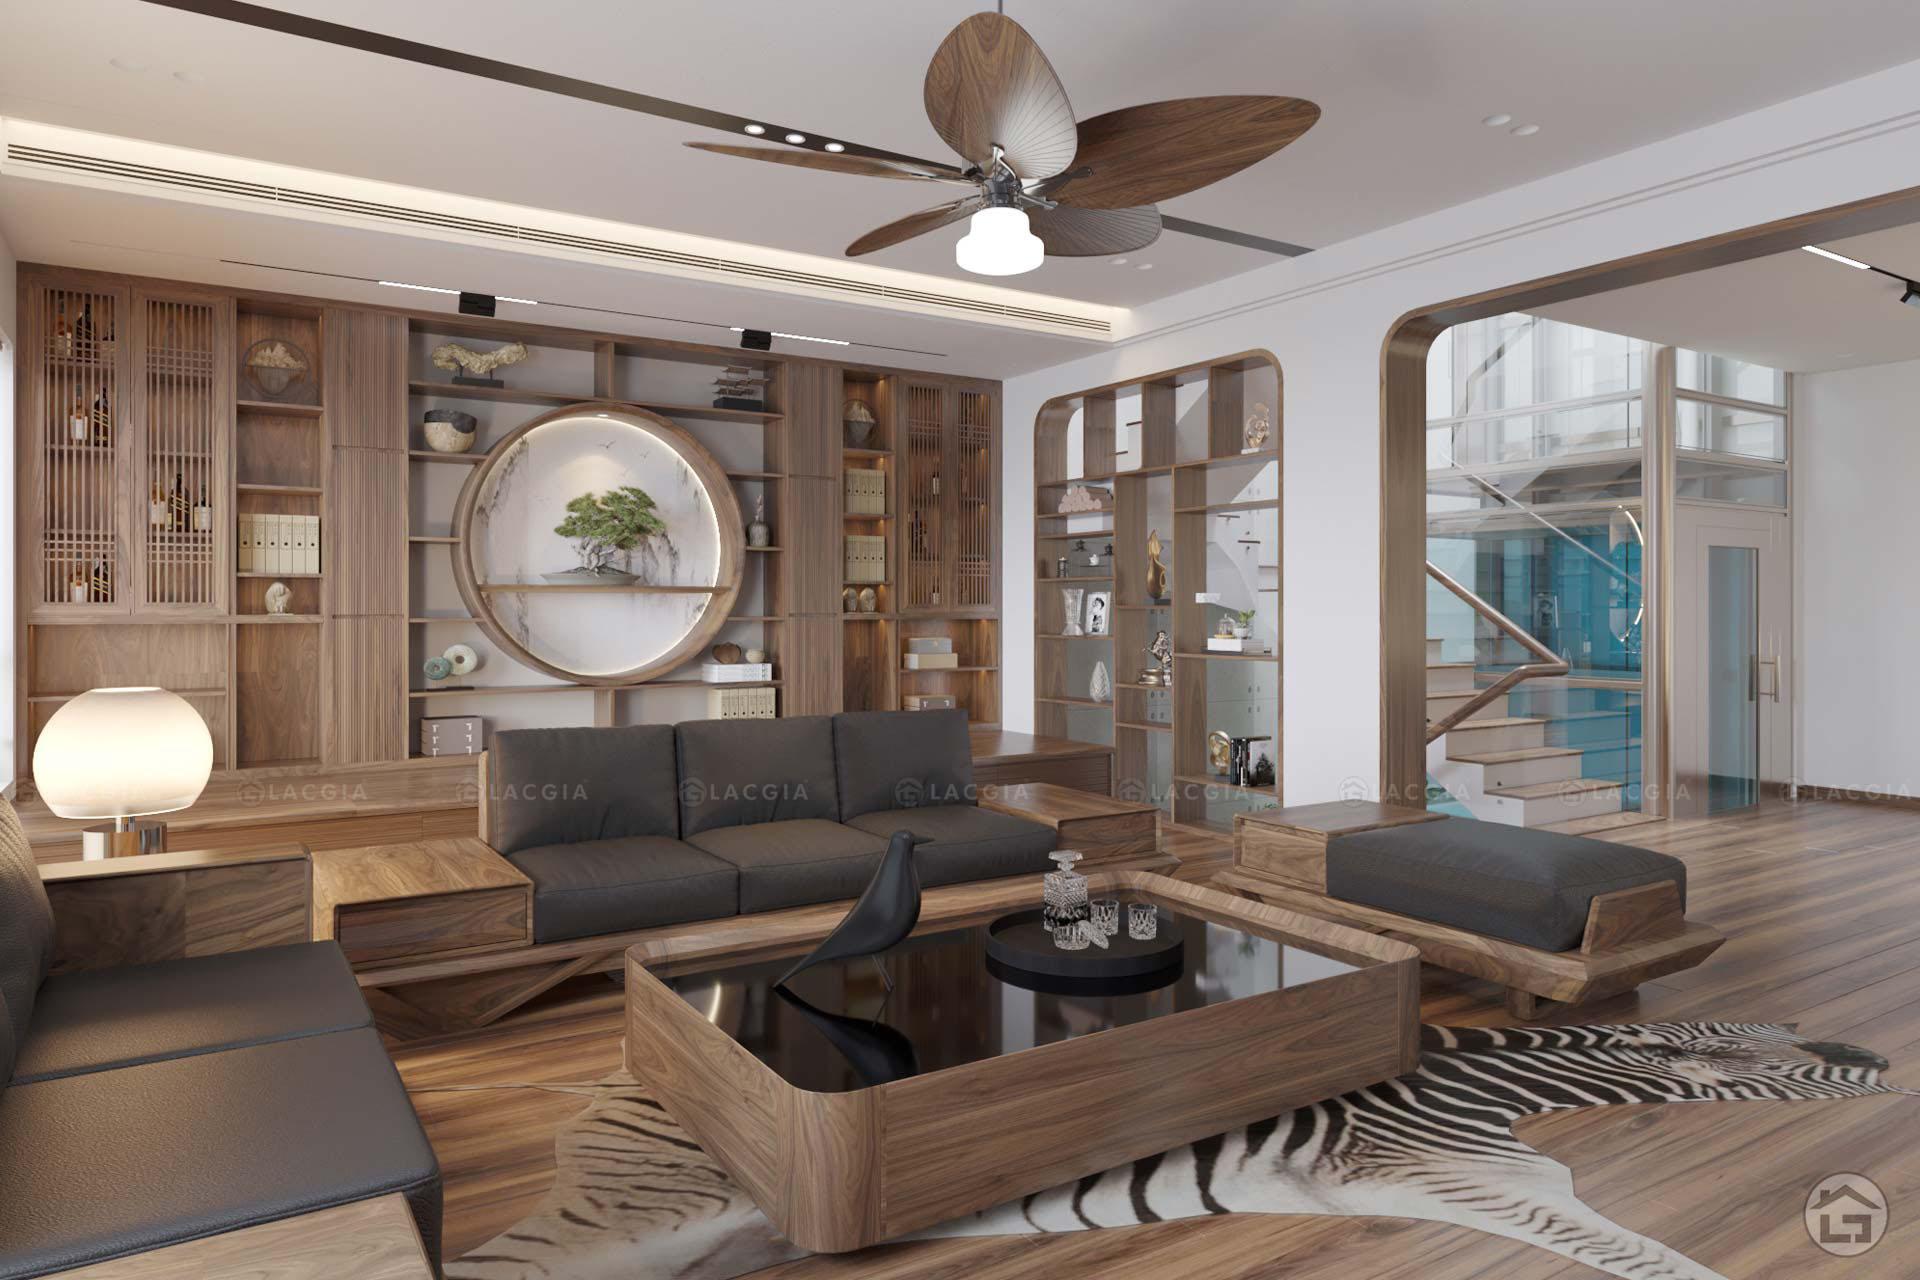 thiet ke noi that biet thu lien ke geleximco le trong tan 34 - Dự án thiết kế nội thất biệt thự Vinhomes Riverside